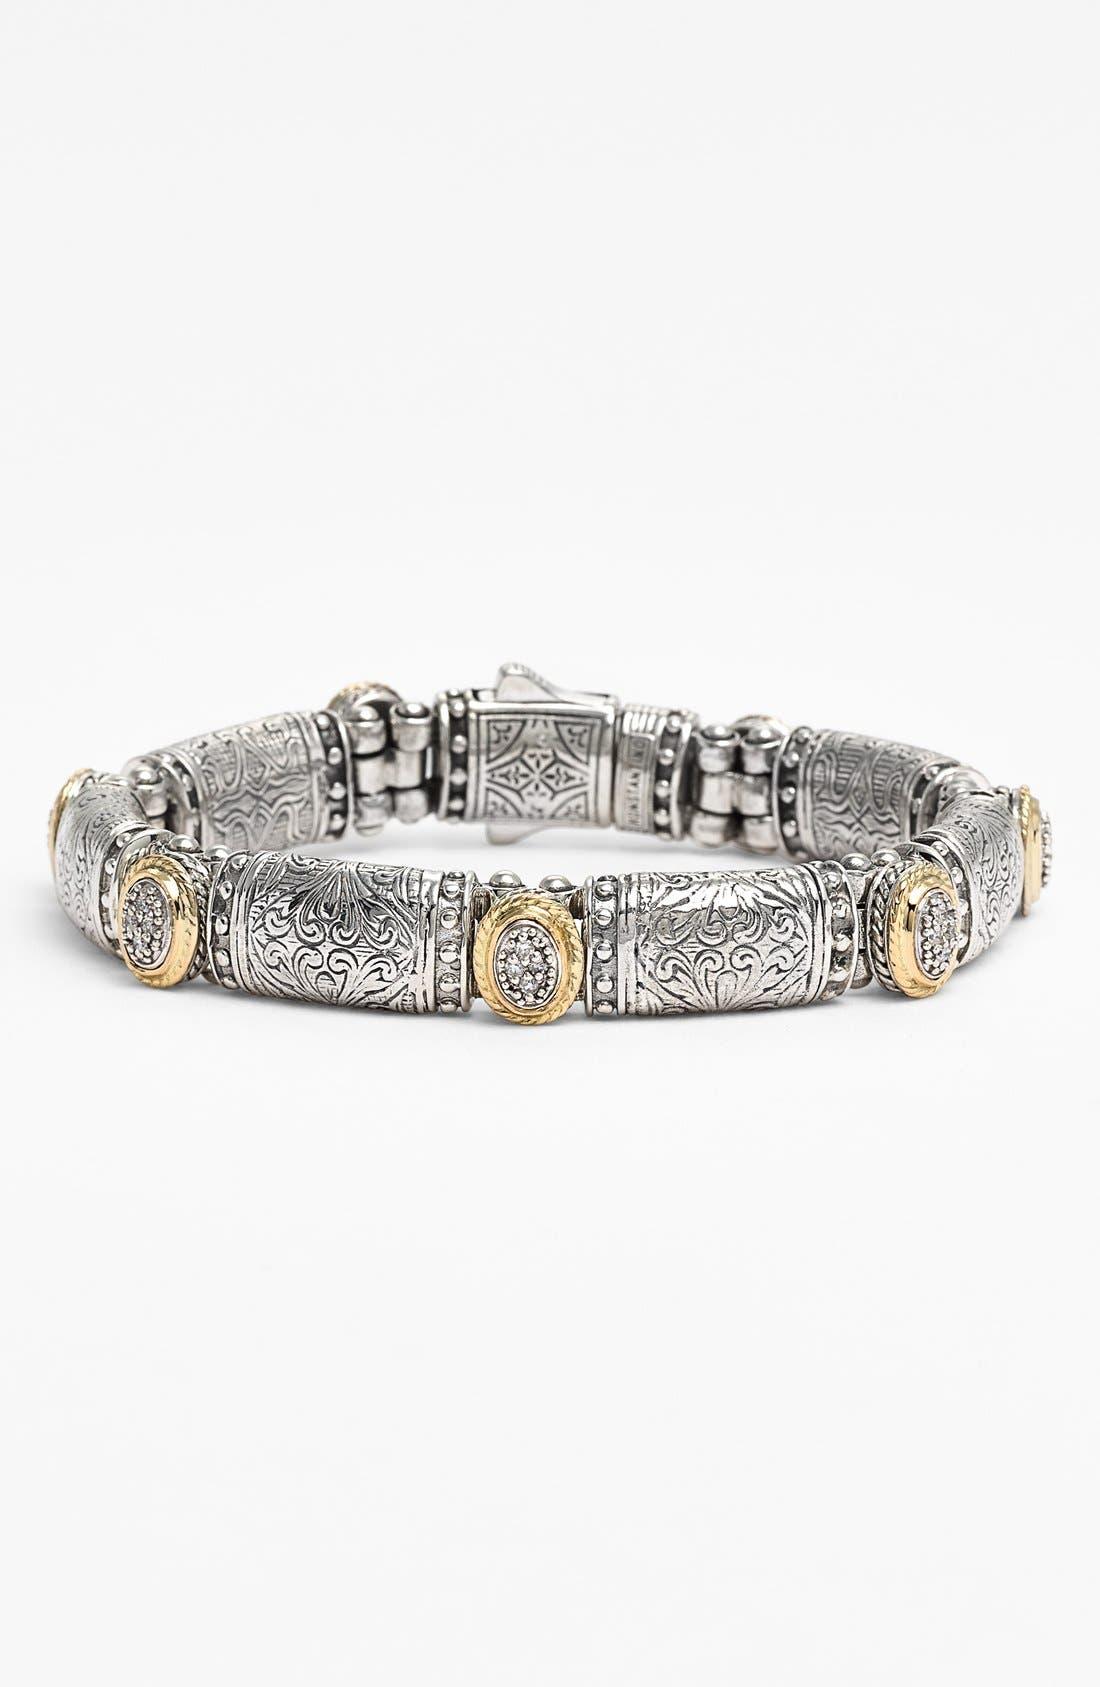 Konstantino 'Classics' Diamond Bracelet